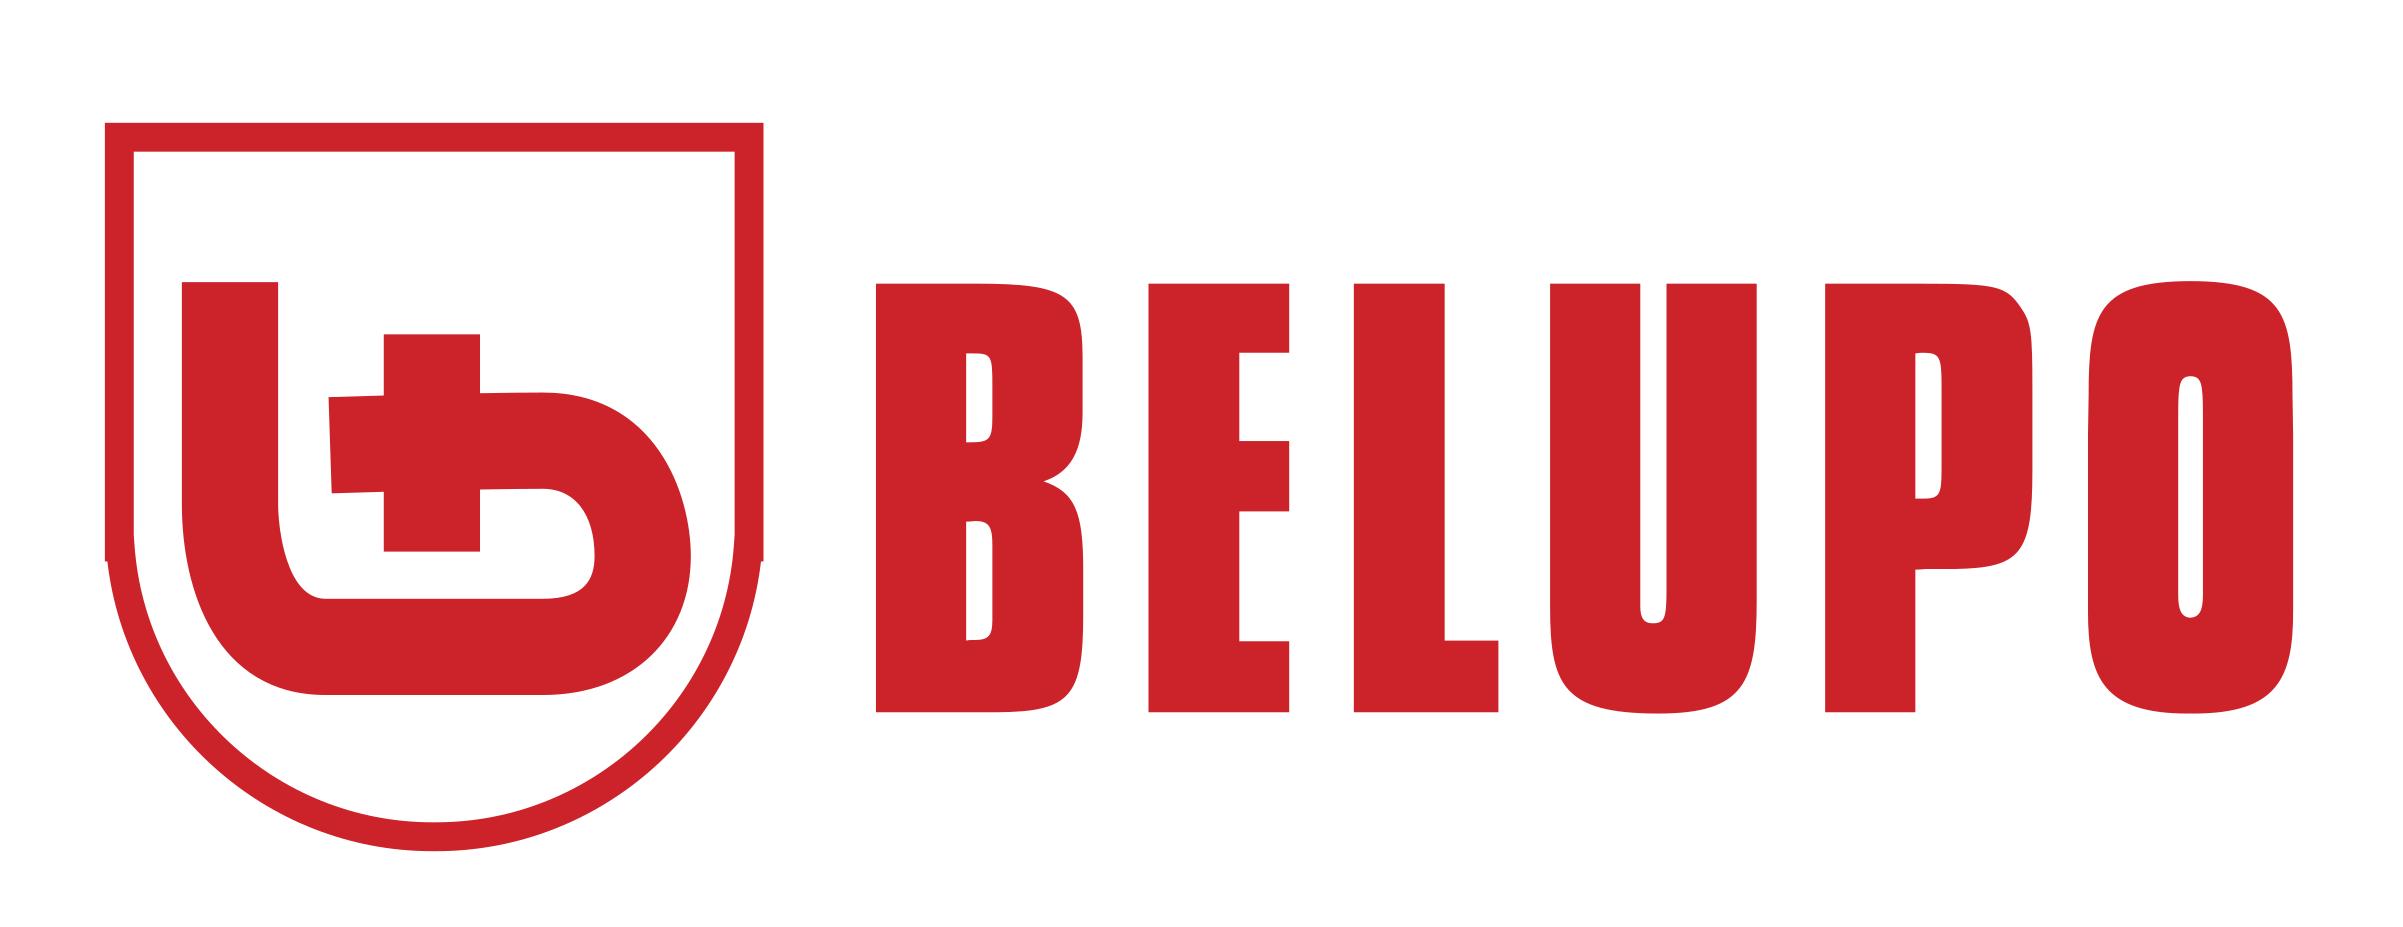 belupo-logo-png-transparent